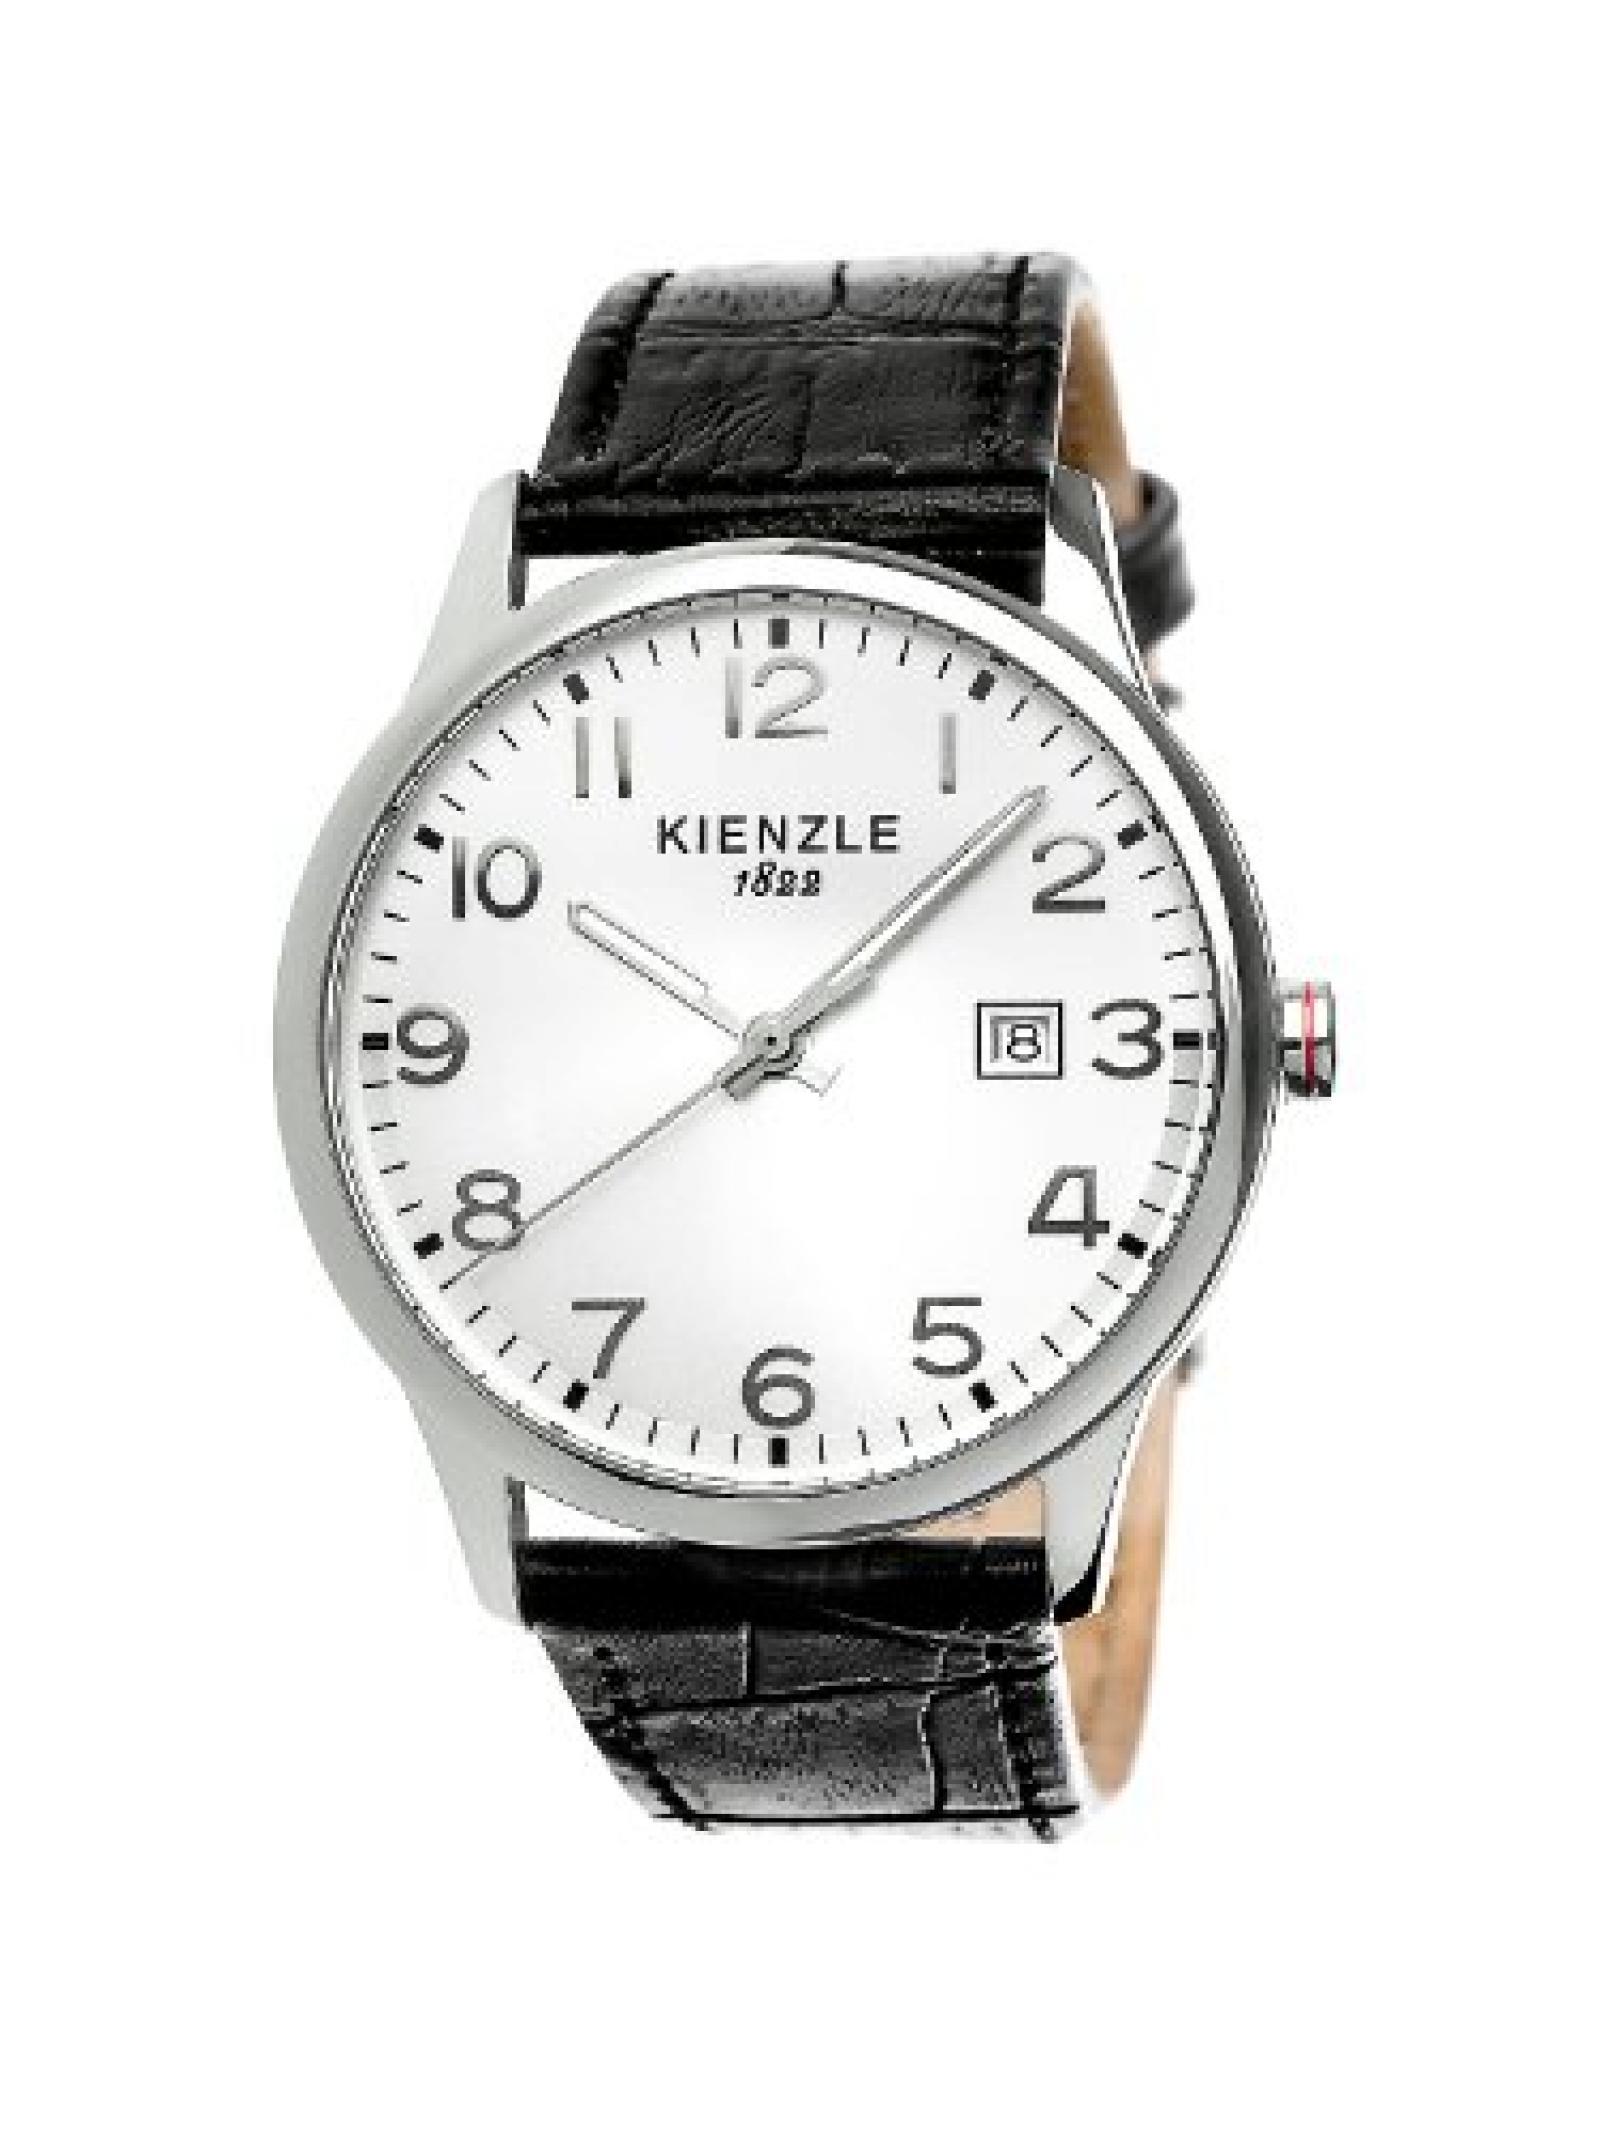 Kienzle Damen-Armbanduhr XS KIENZLE CORE Analog Quarz Lederarmband K3042012151-00360